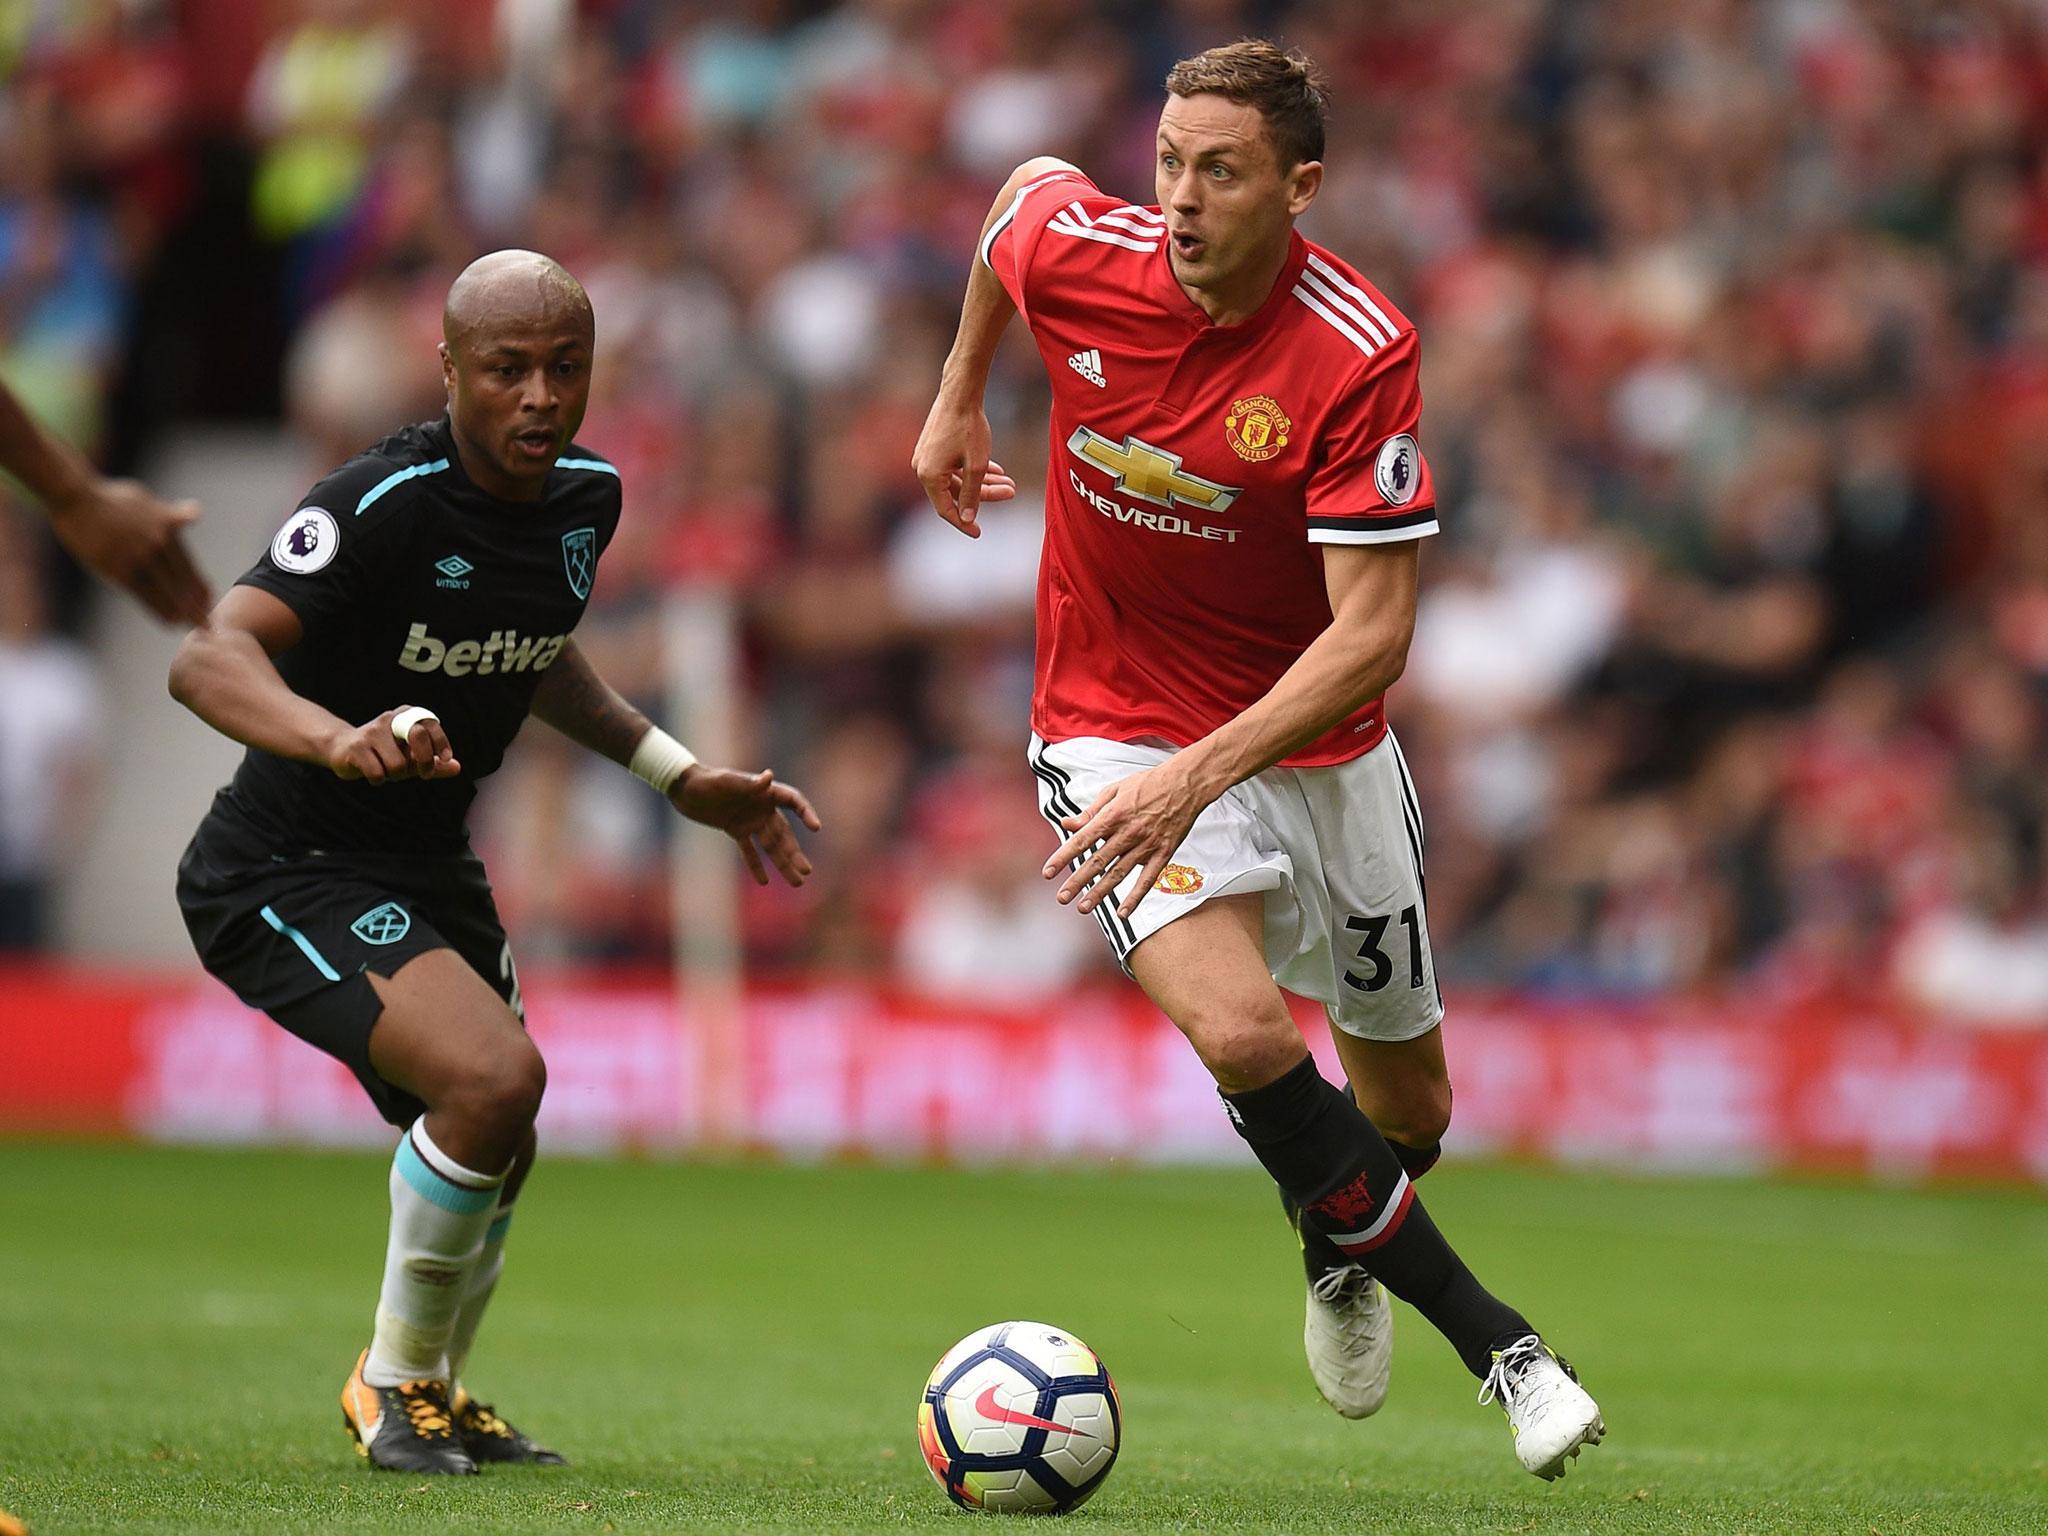 Manchester United Vs West Ham Player Ratings: Romelu